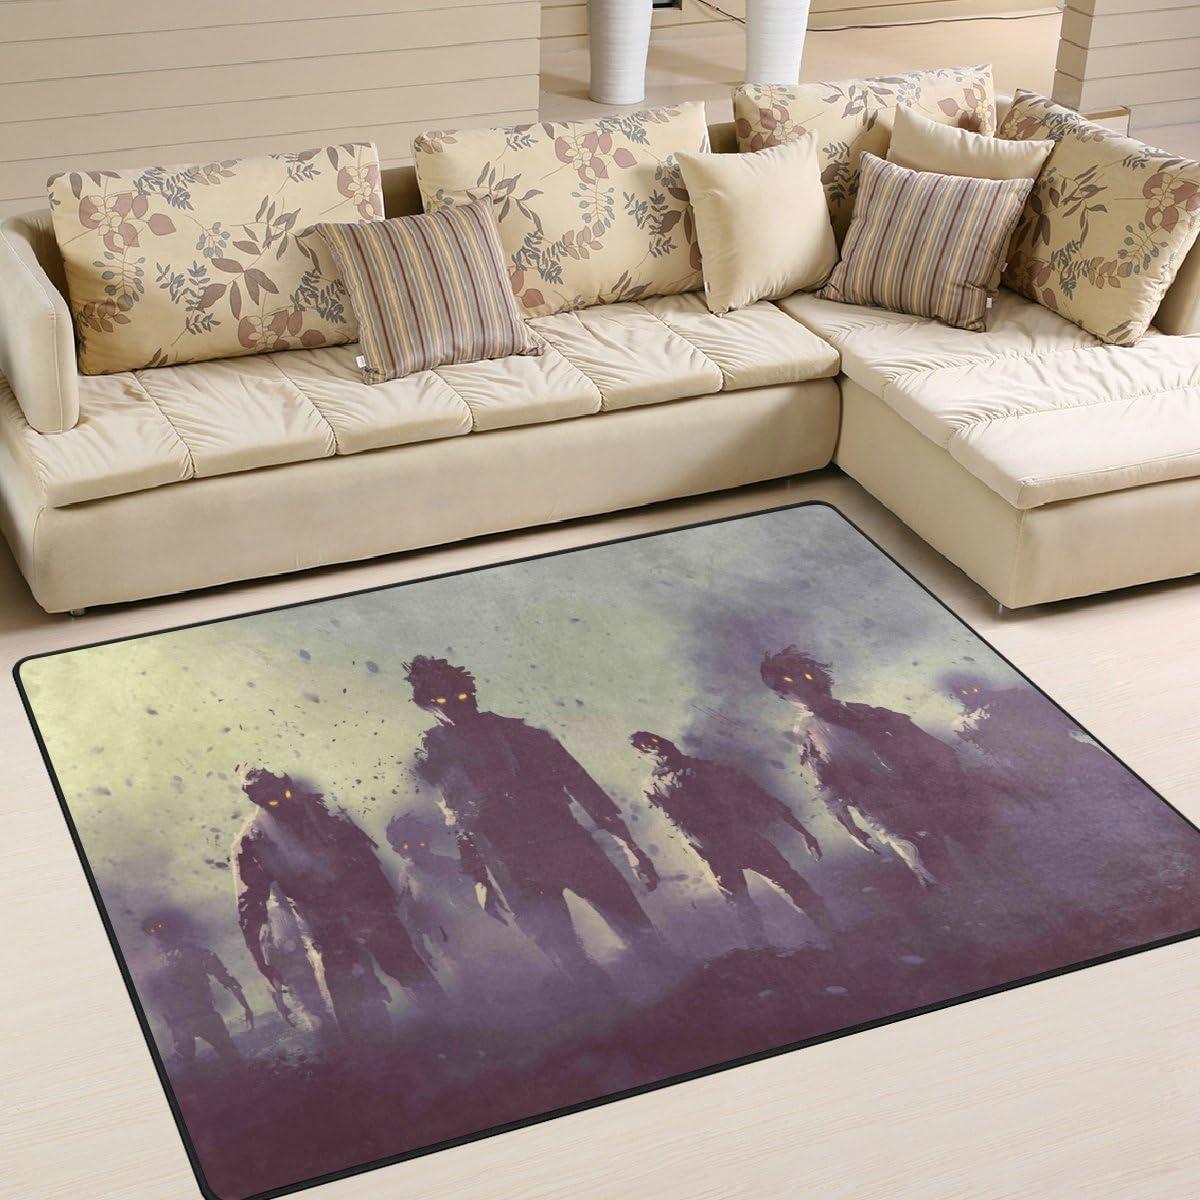 SAVSV Large Area Rugs Zombie Crowd Walking at Nigh Printed,Lightweight Water-Repellent Floor Carpet